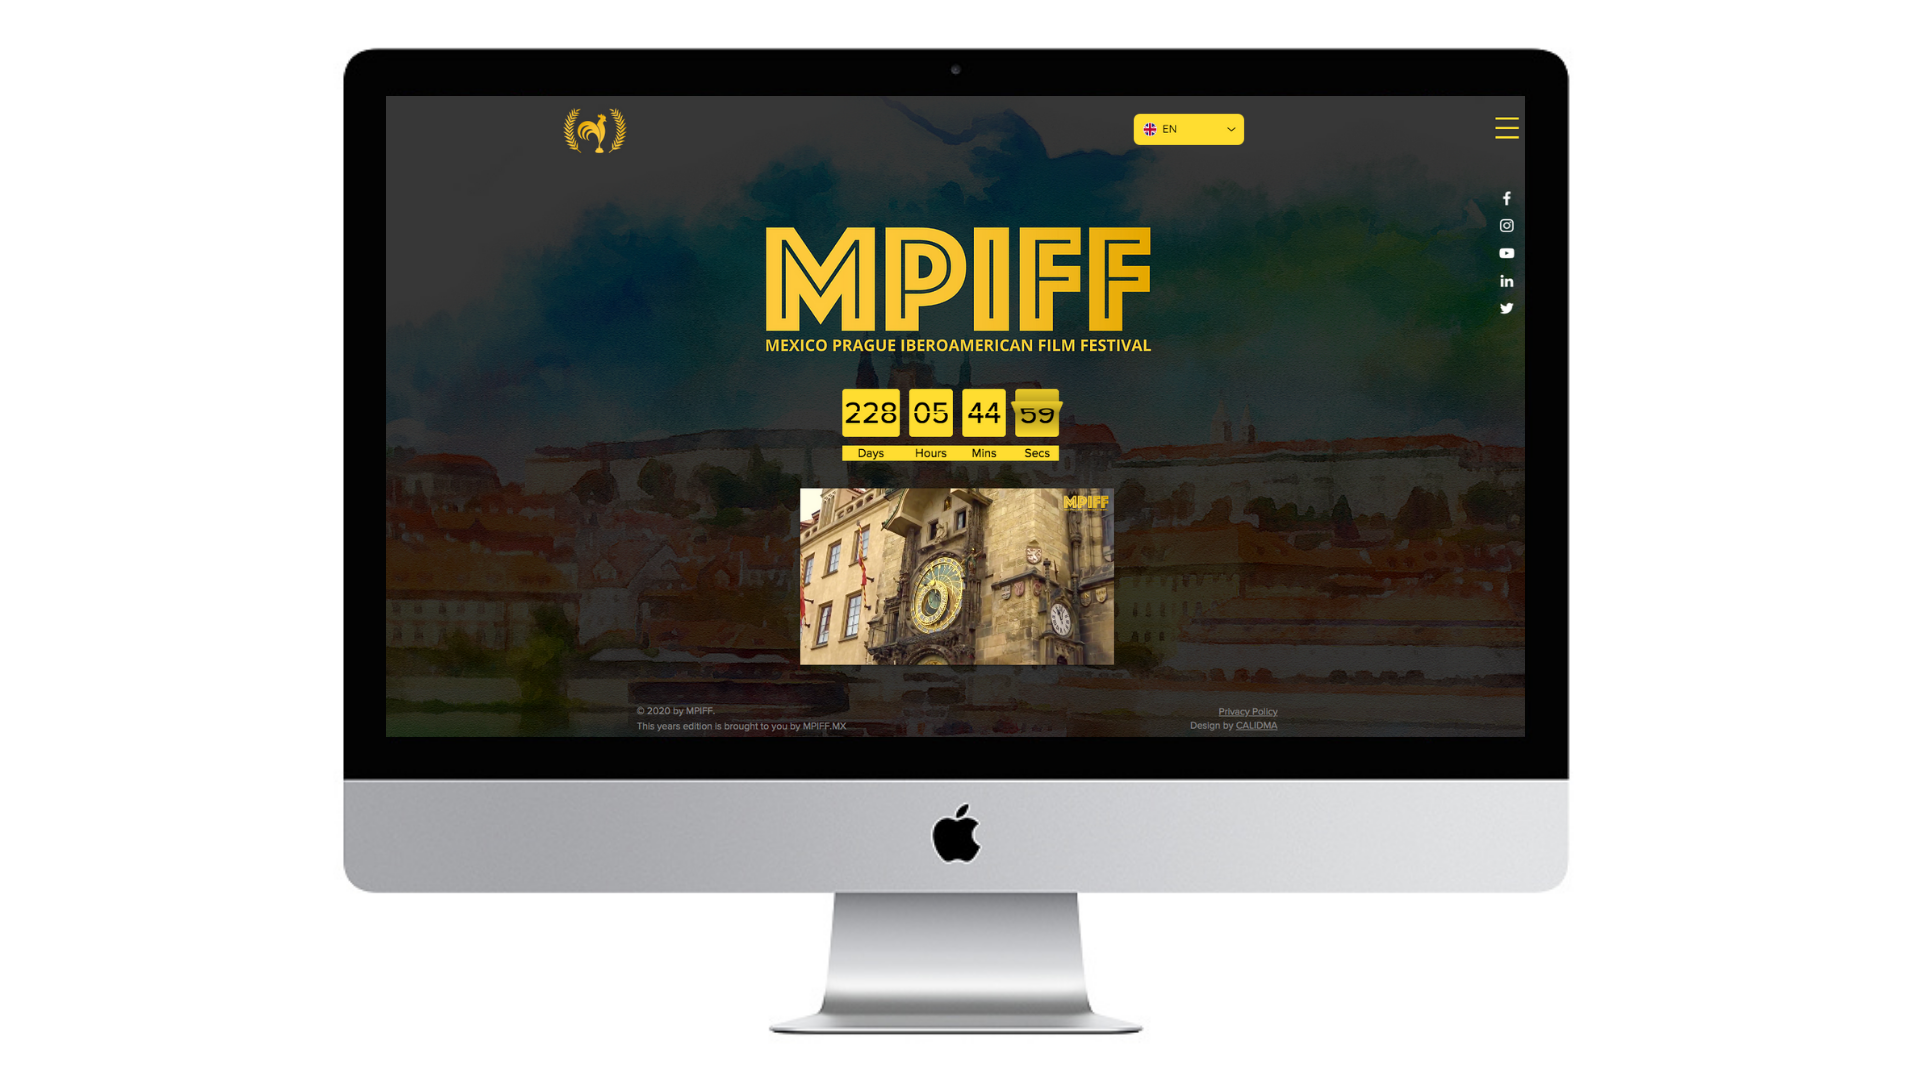 MPIFF - Mexico Prague Iberoamerican Film Festival